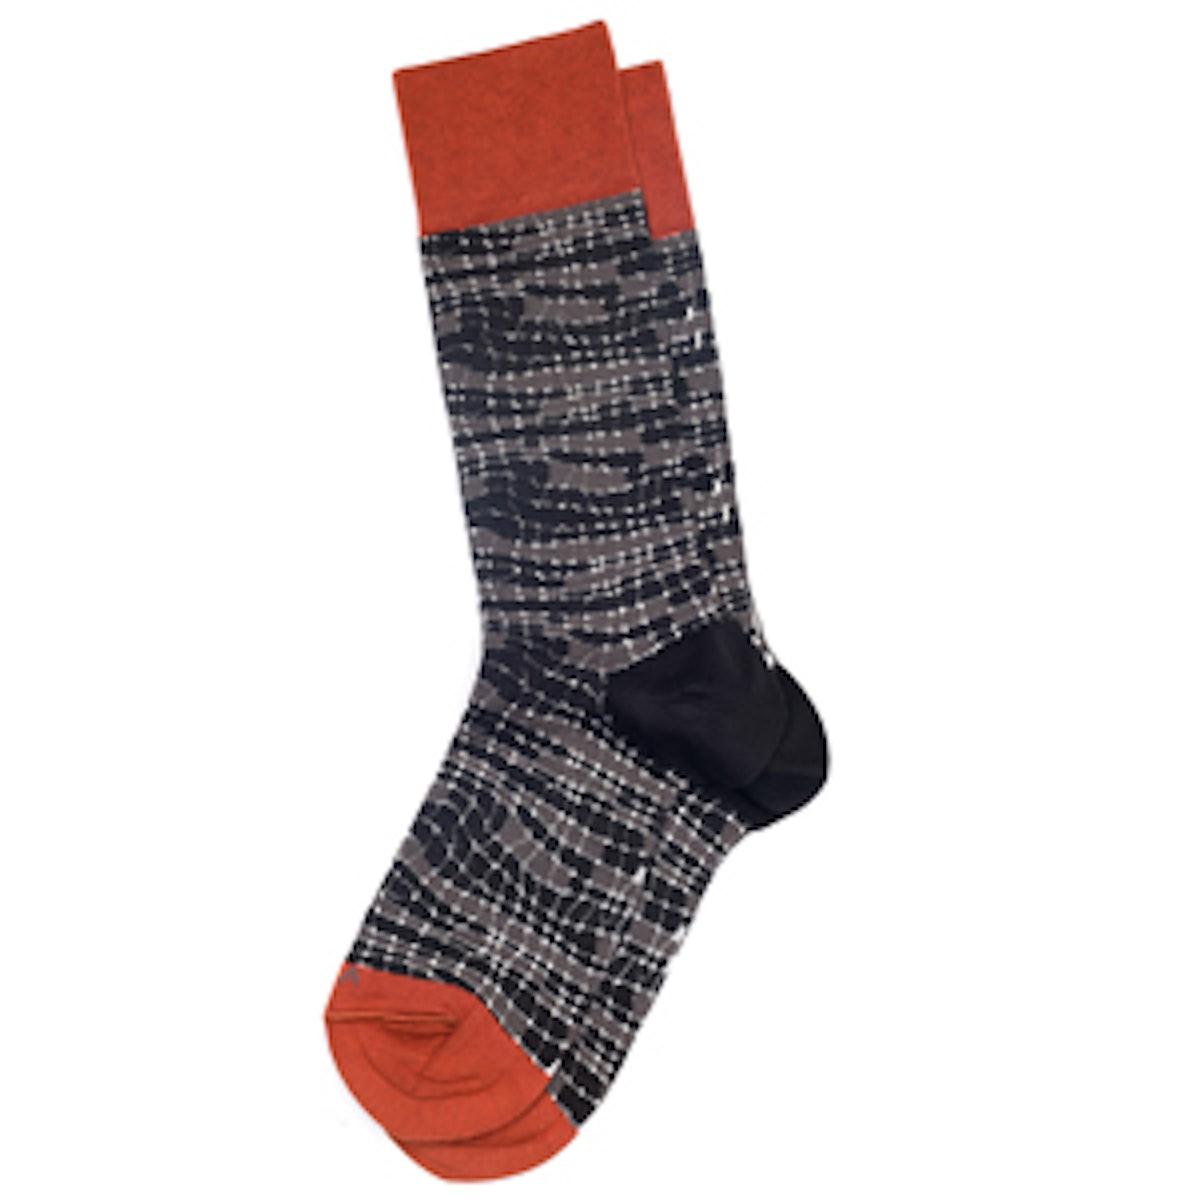 Crock Dress Socks